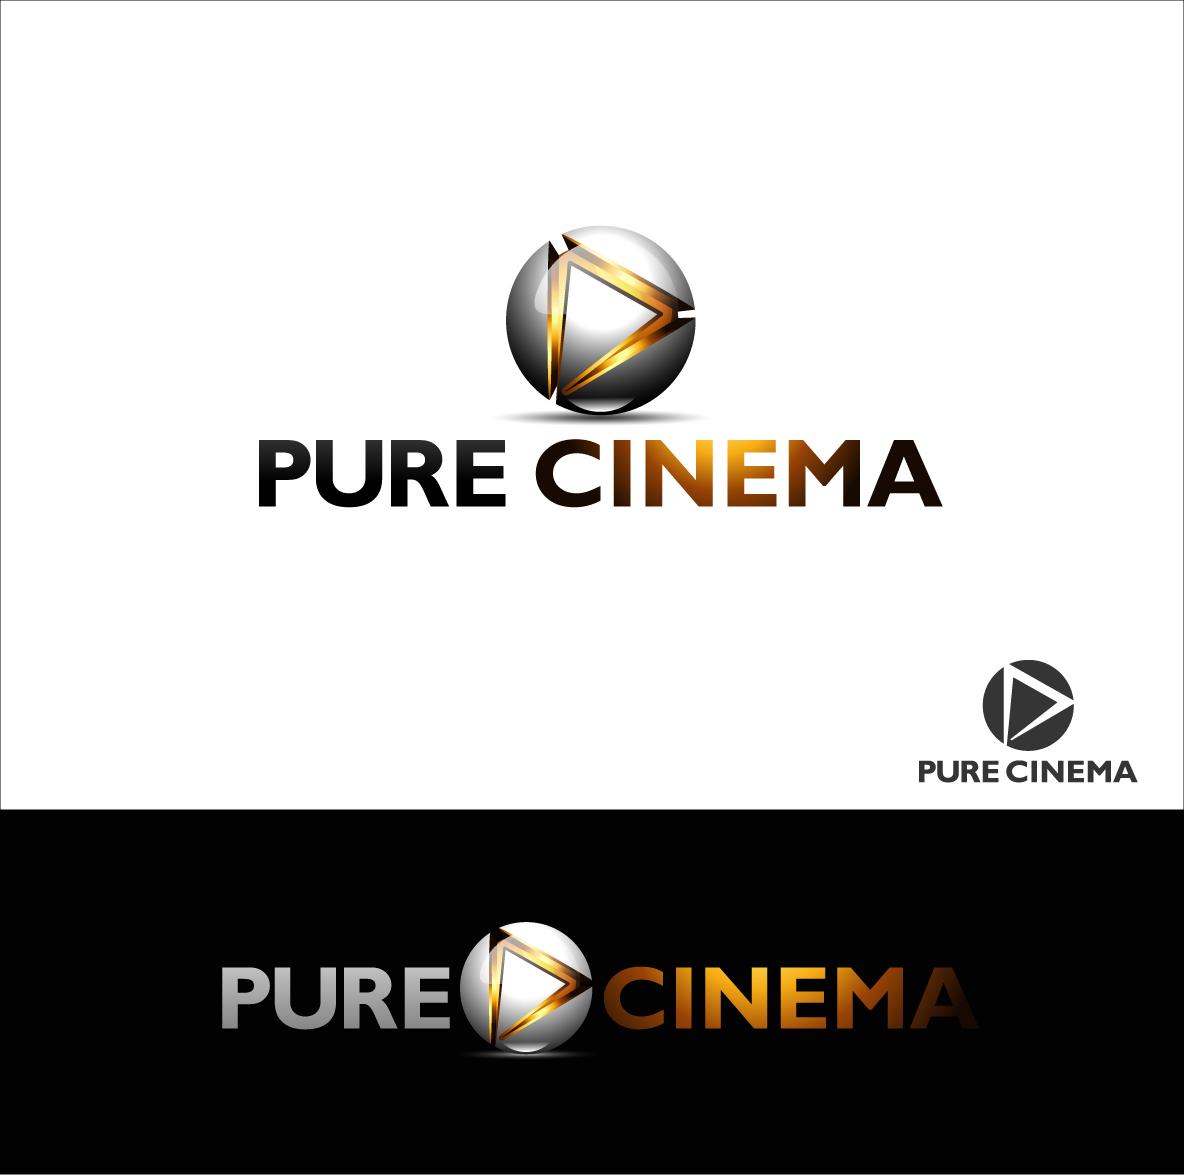 Logo Design by zoiDesign - Entry No. 101 in the Logo Design Contest Imaginative Logo Design for Pure Cinema.